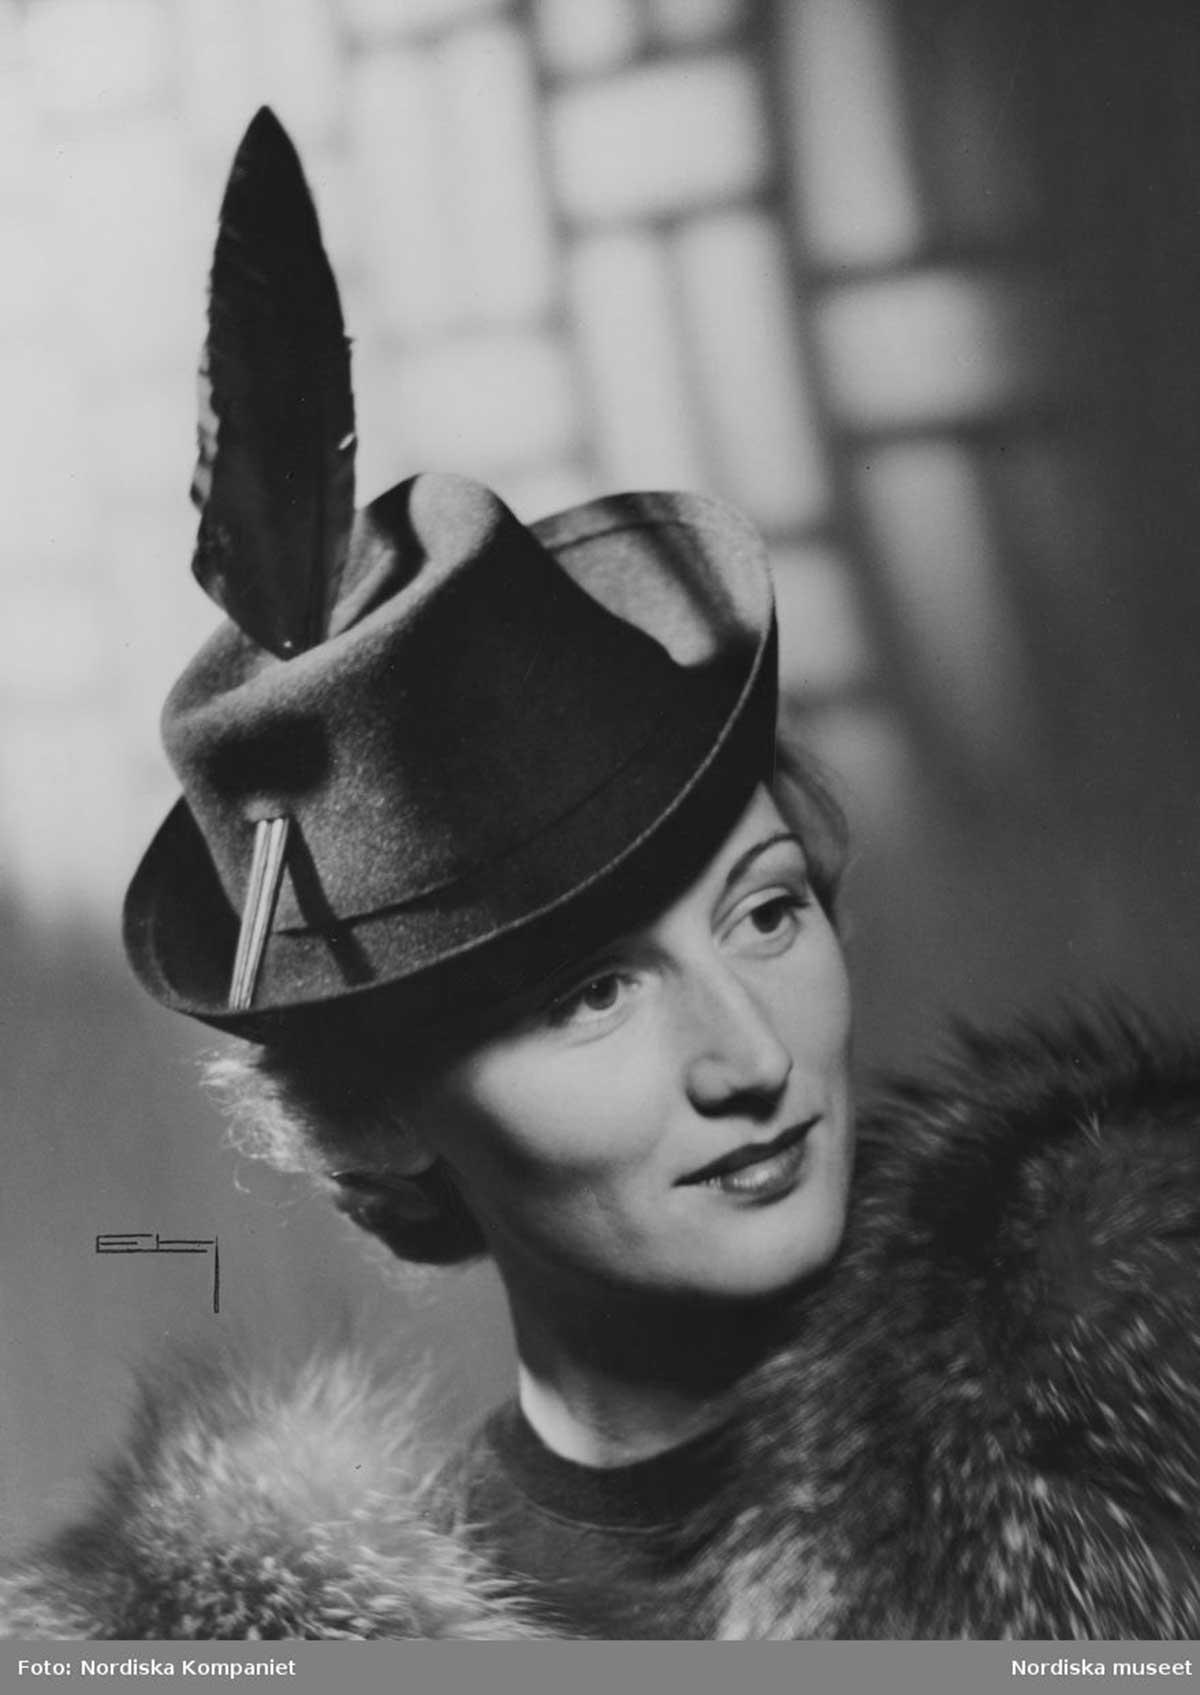 1942 Ladies Homburg hat and feather